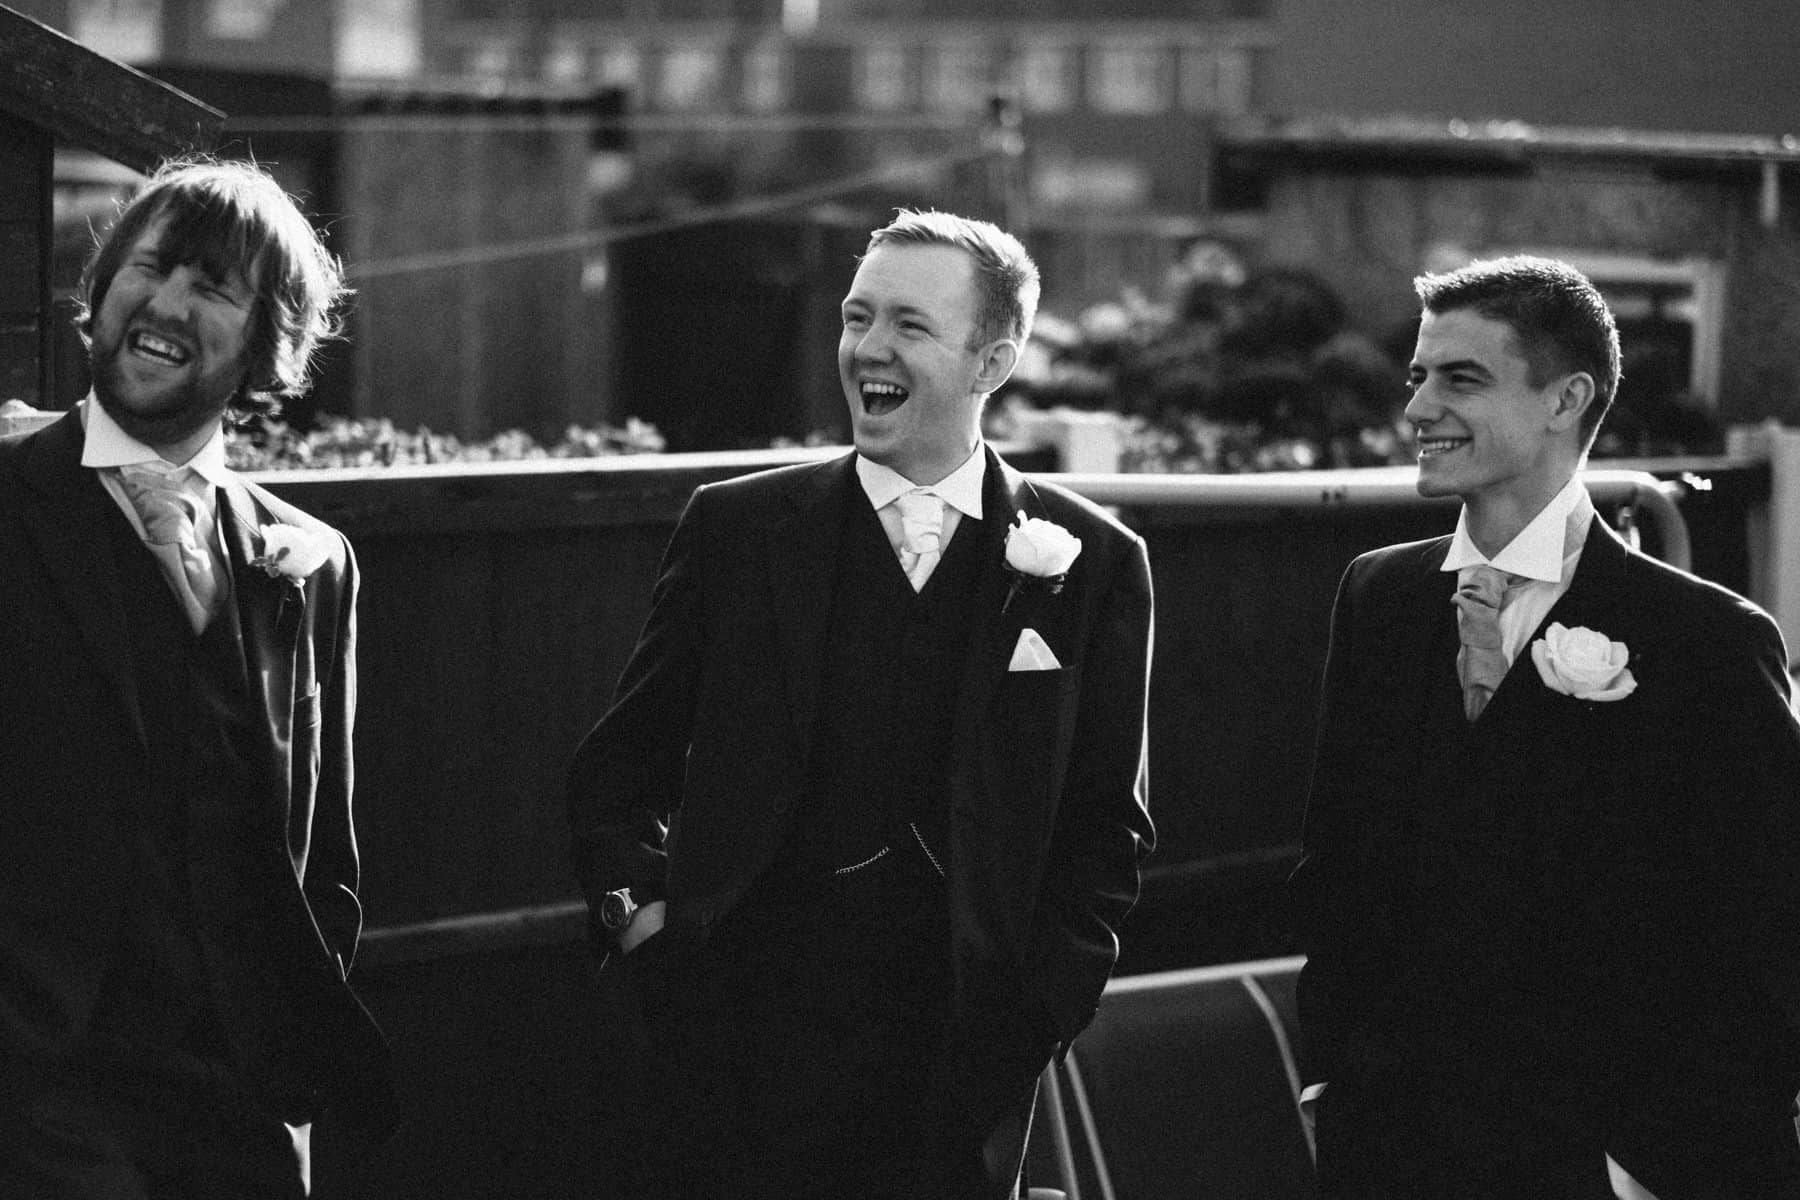 wedding photography groom preps (1 of 1)